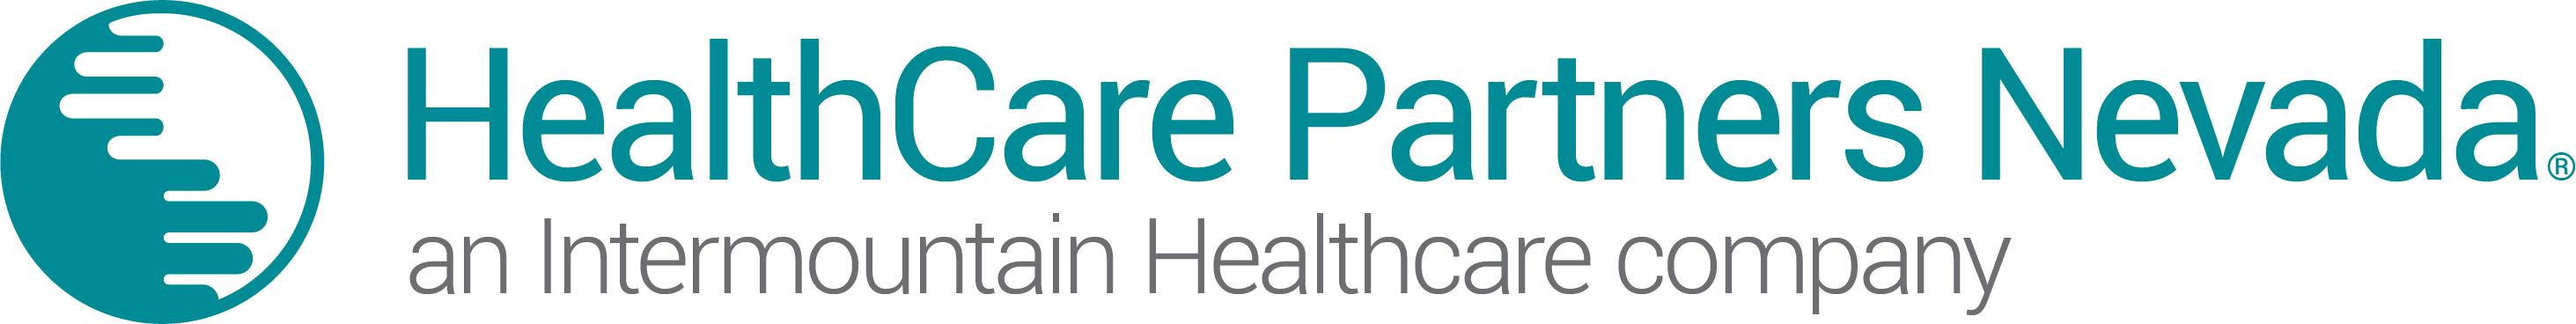 HealthCare Partners - Family Medicine Nurse Practitioner, no call - HealthCare Partners, an Intermountain Healthcare Company